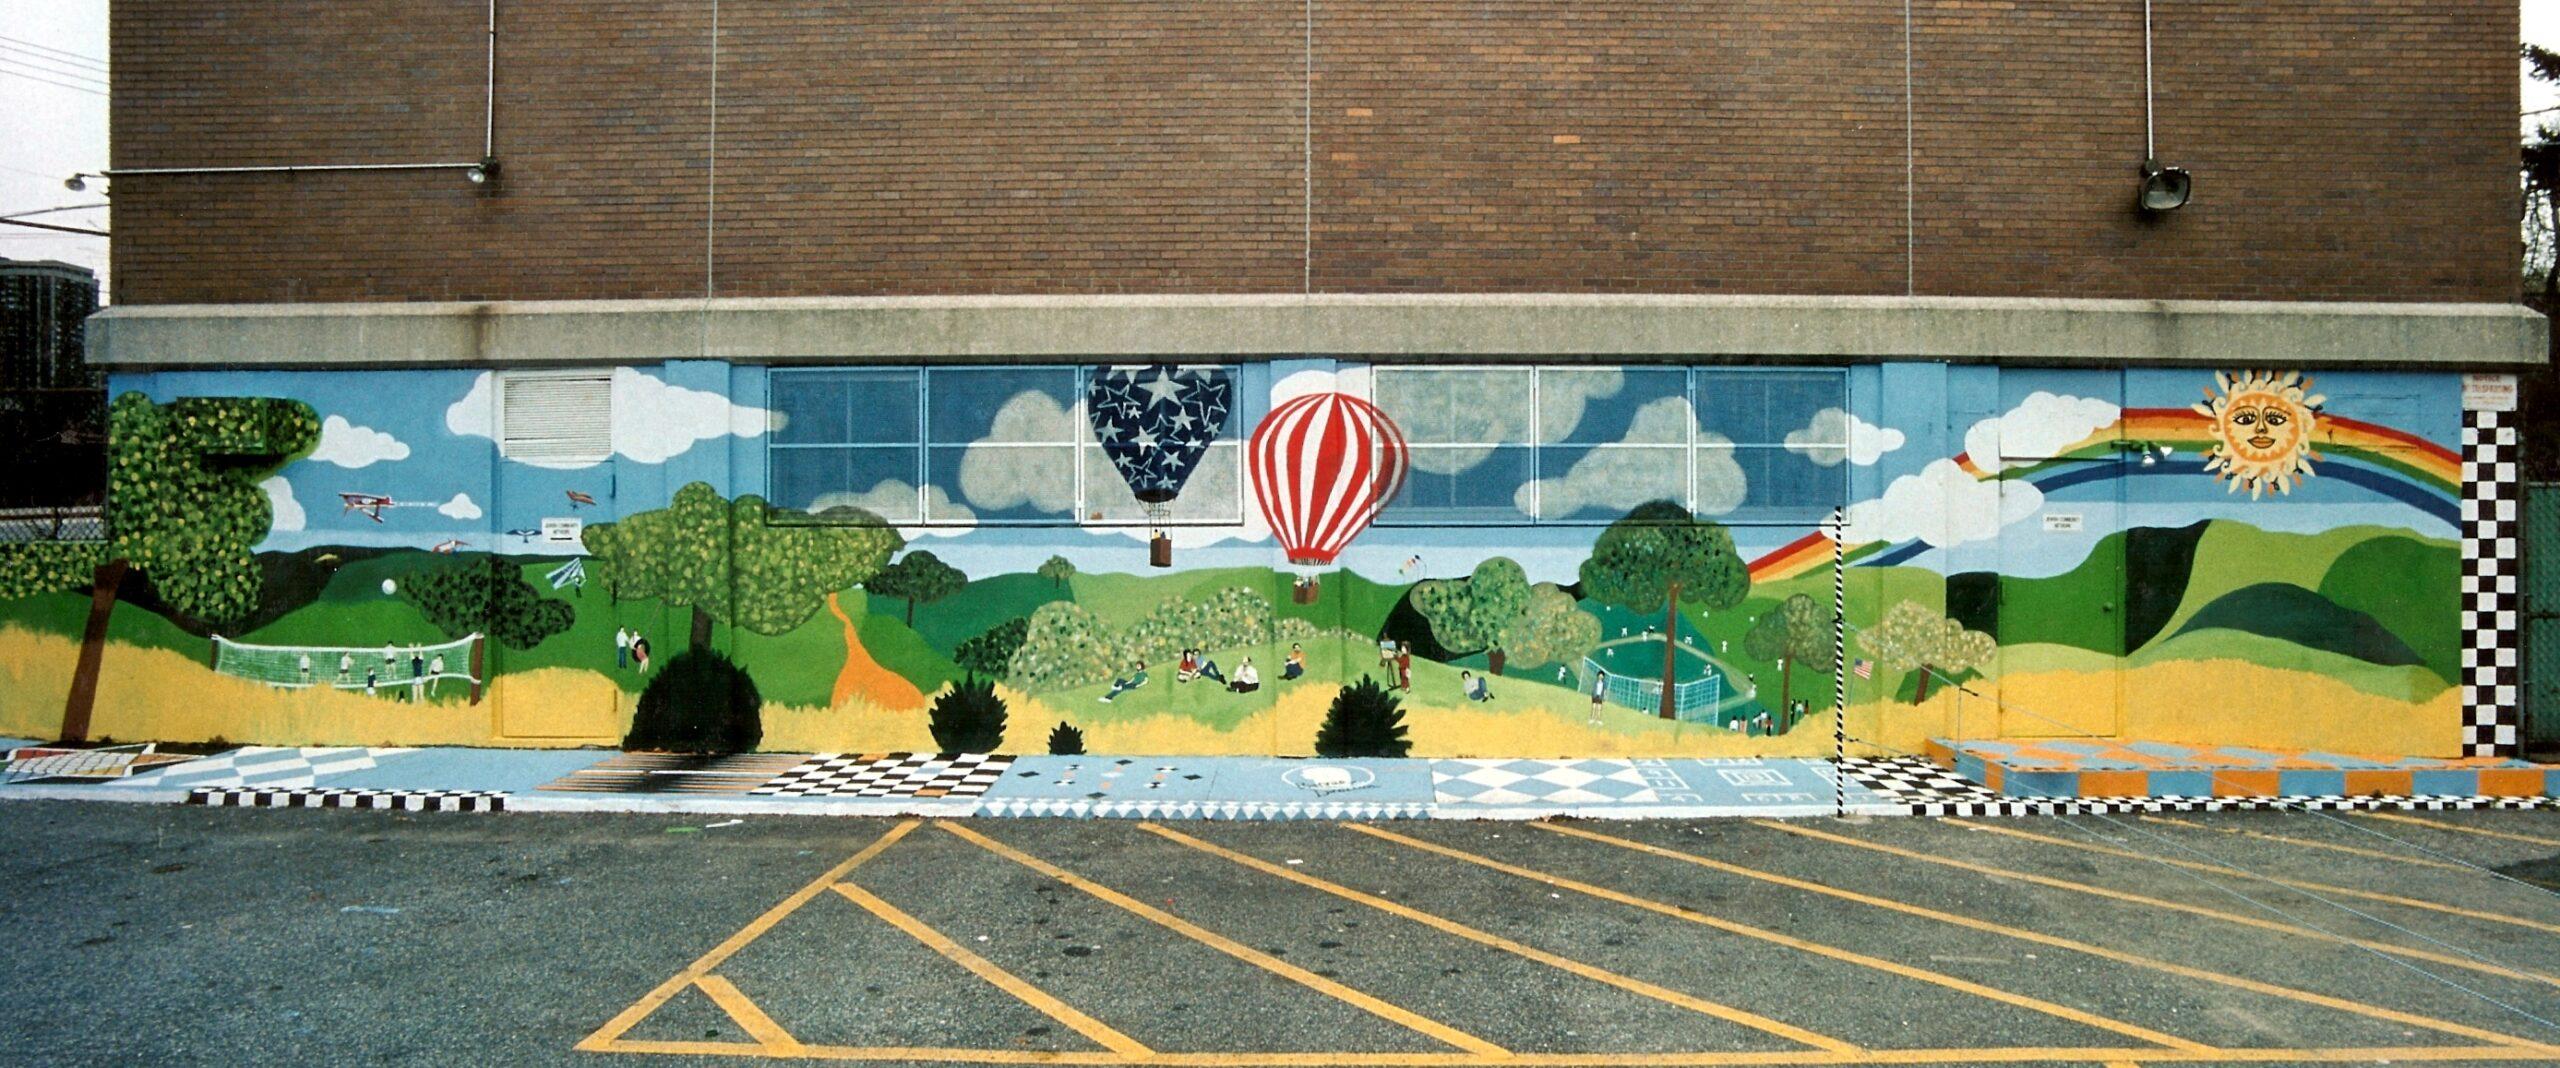 Bonnie siracusa murals fine art for Exterior mural painting